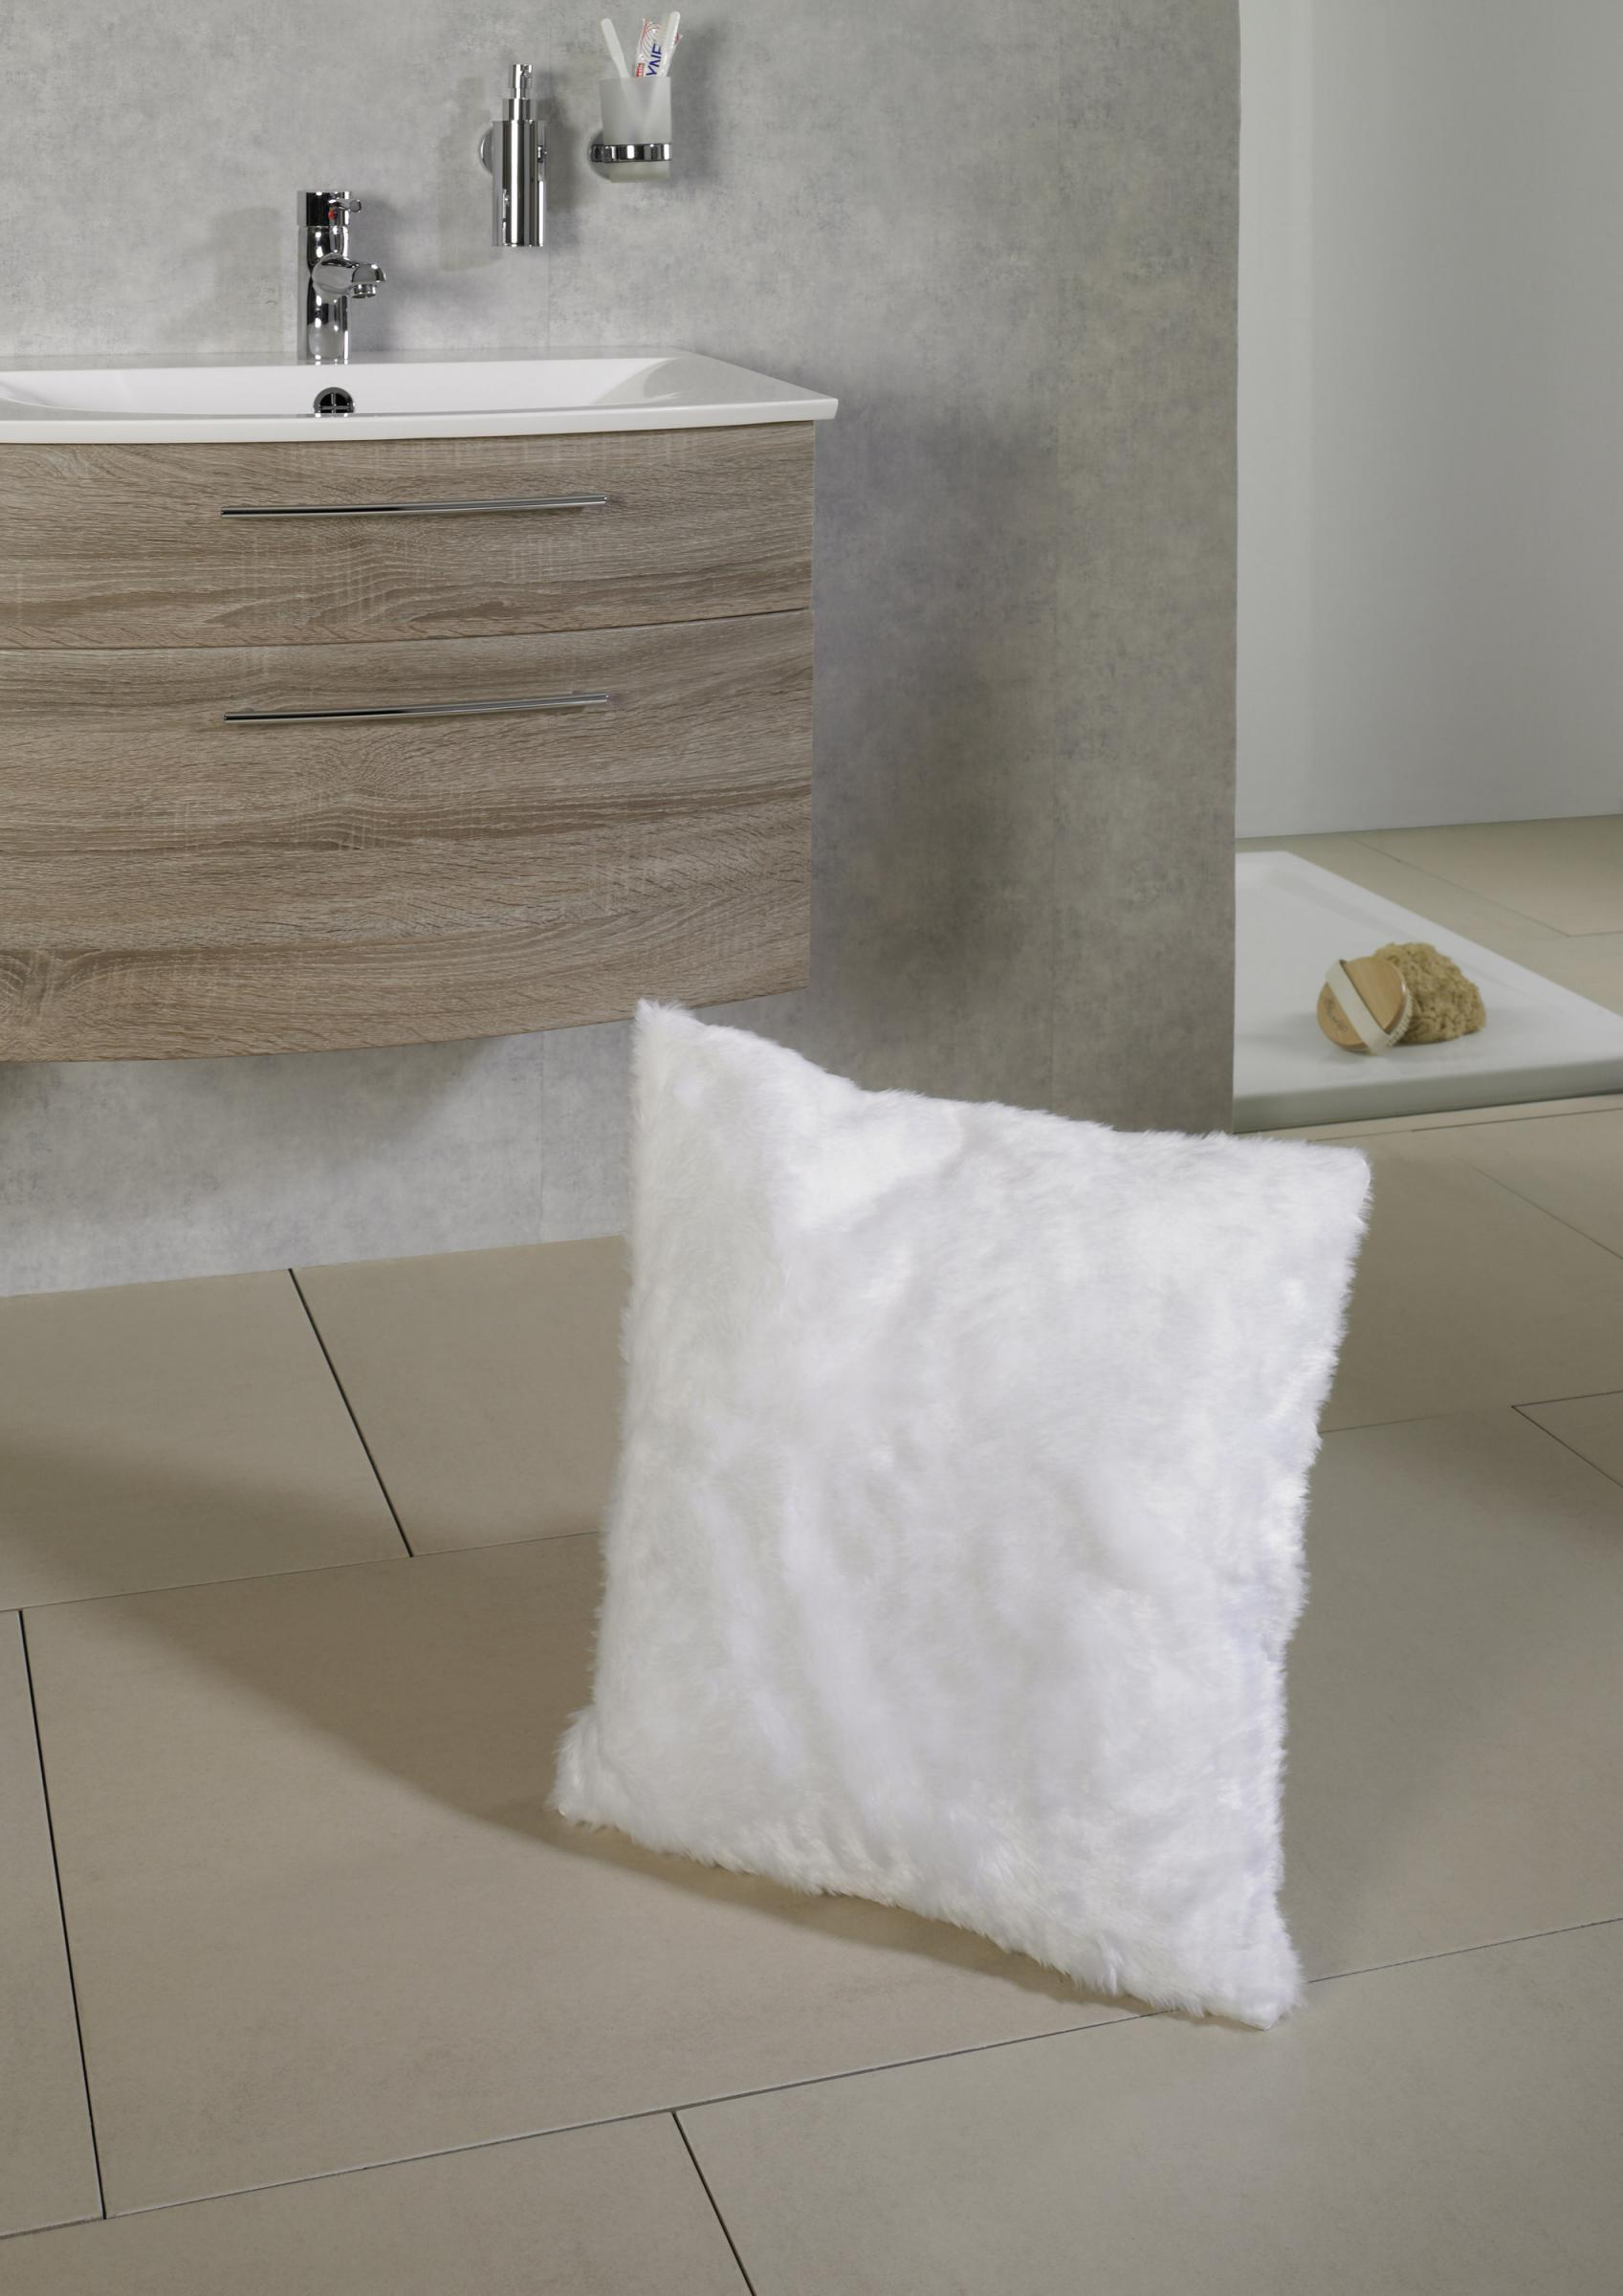 kissen bez ge maja wei in fellimitat 50x50 artra quadratisch mit rei verschluss kissenh lle. Black Bedroom Furniture Sets. Home Design Ideas